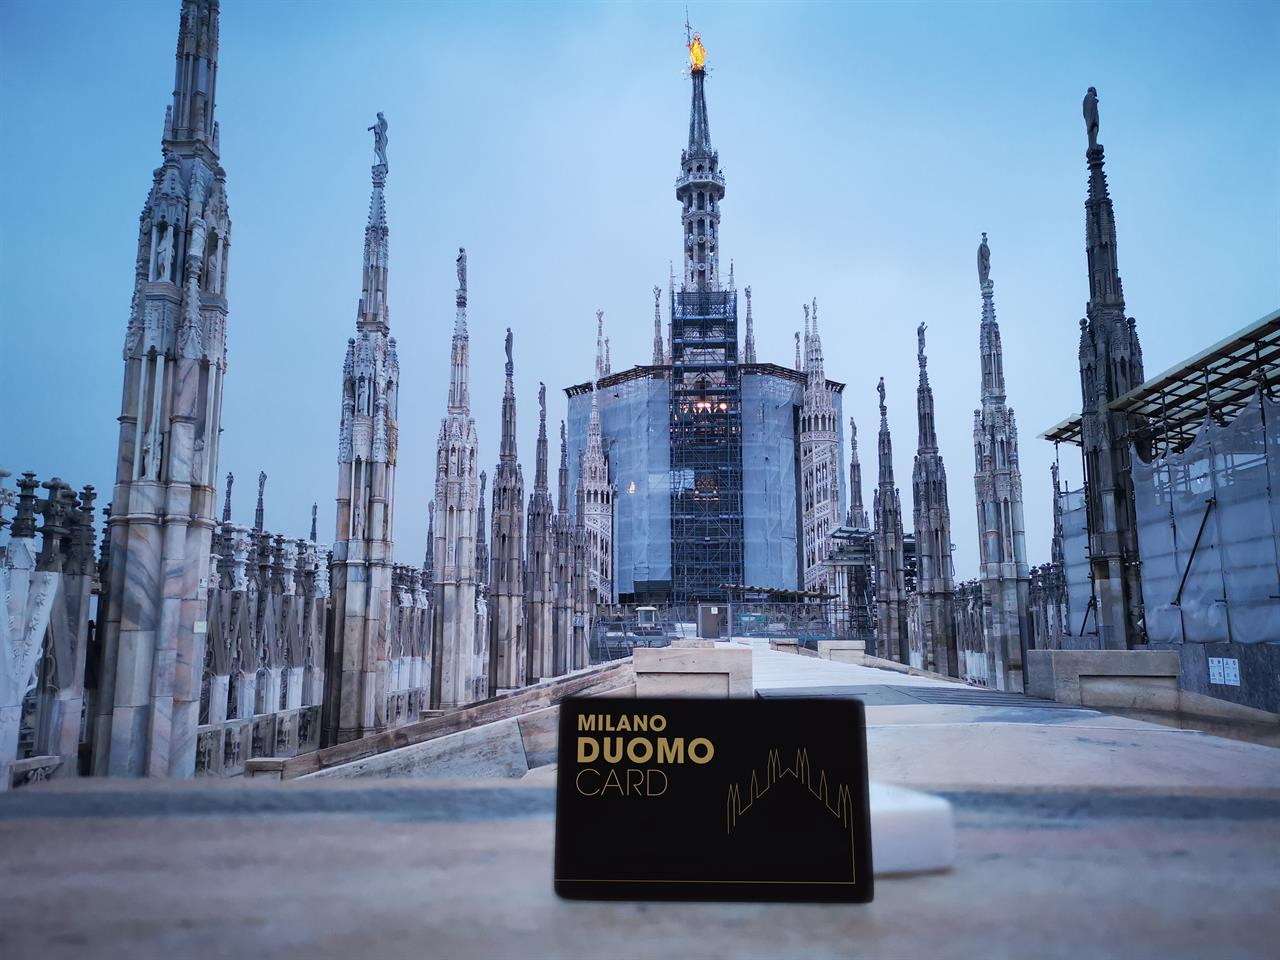 Milano Duomo Card 3 © Veneranda Fabbrica Del Duomo Di Milano